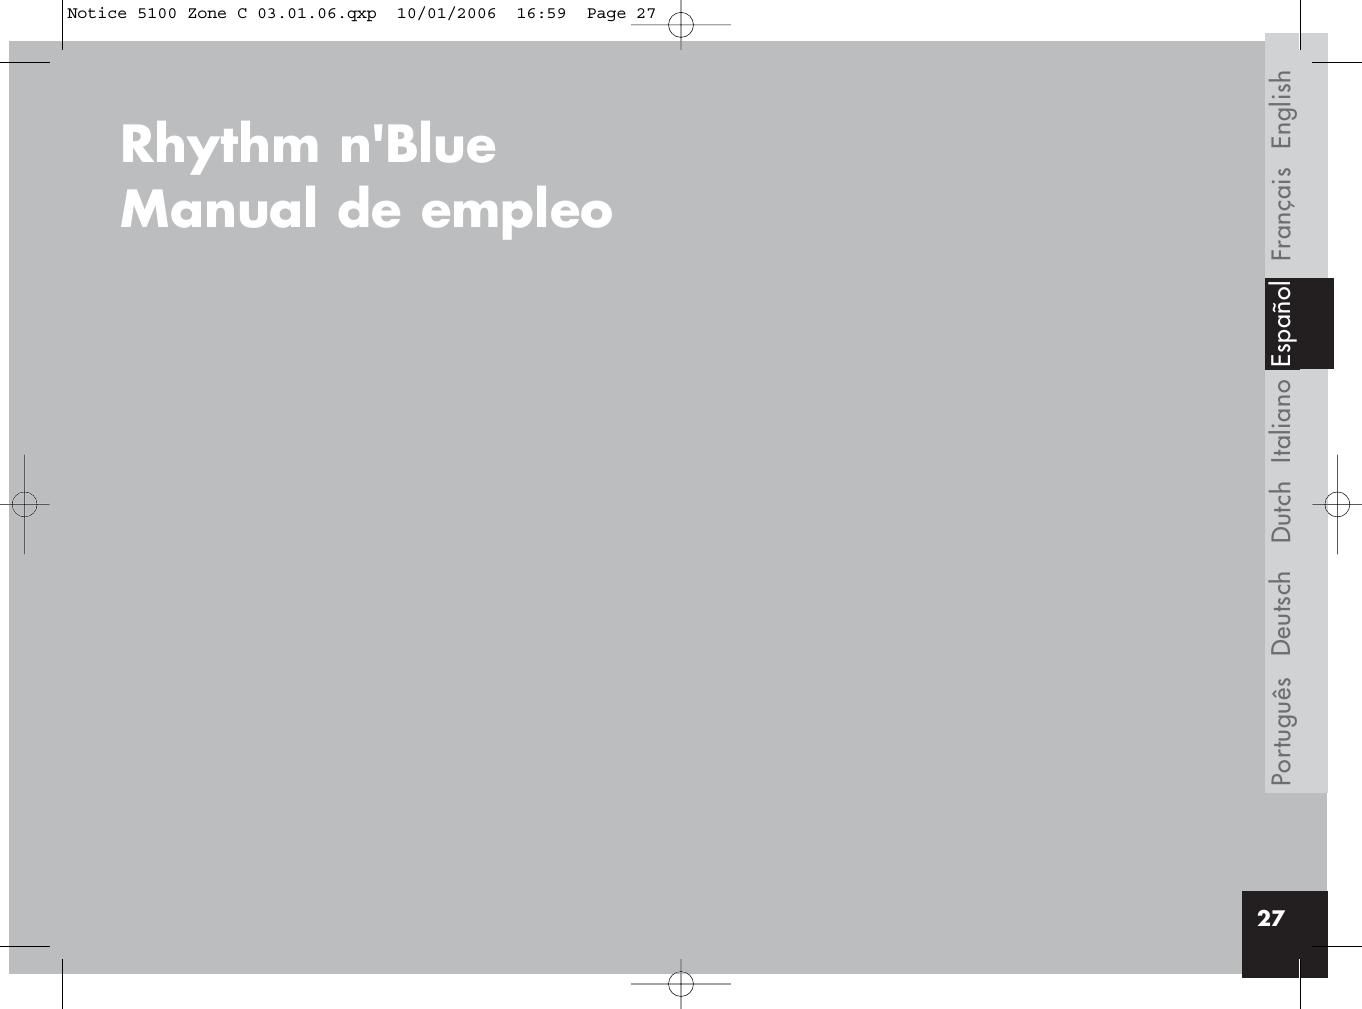 parrot rhythm n blue user manual